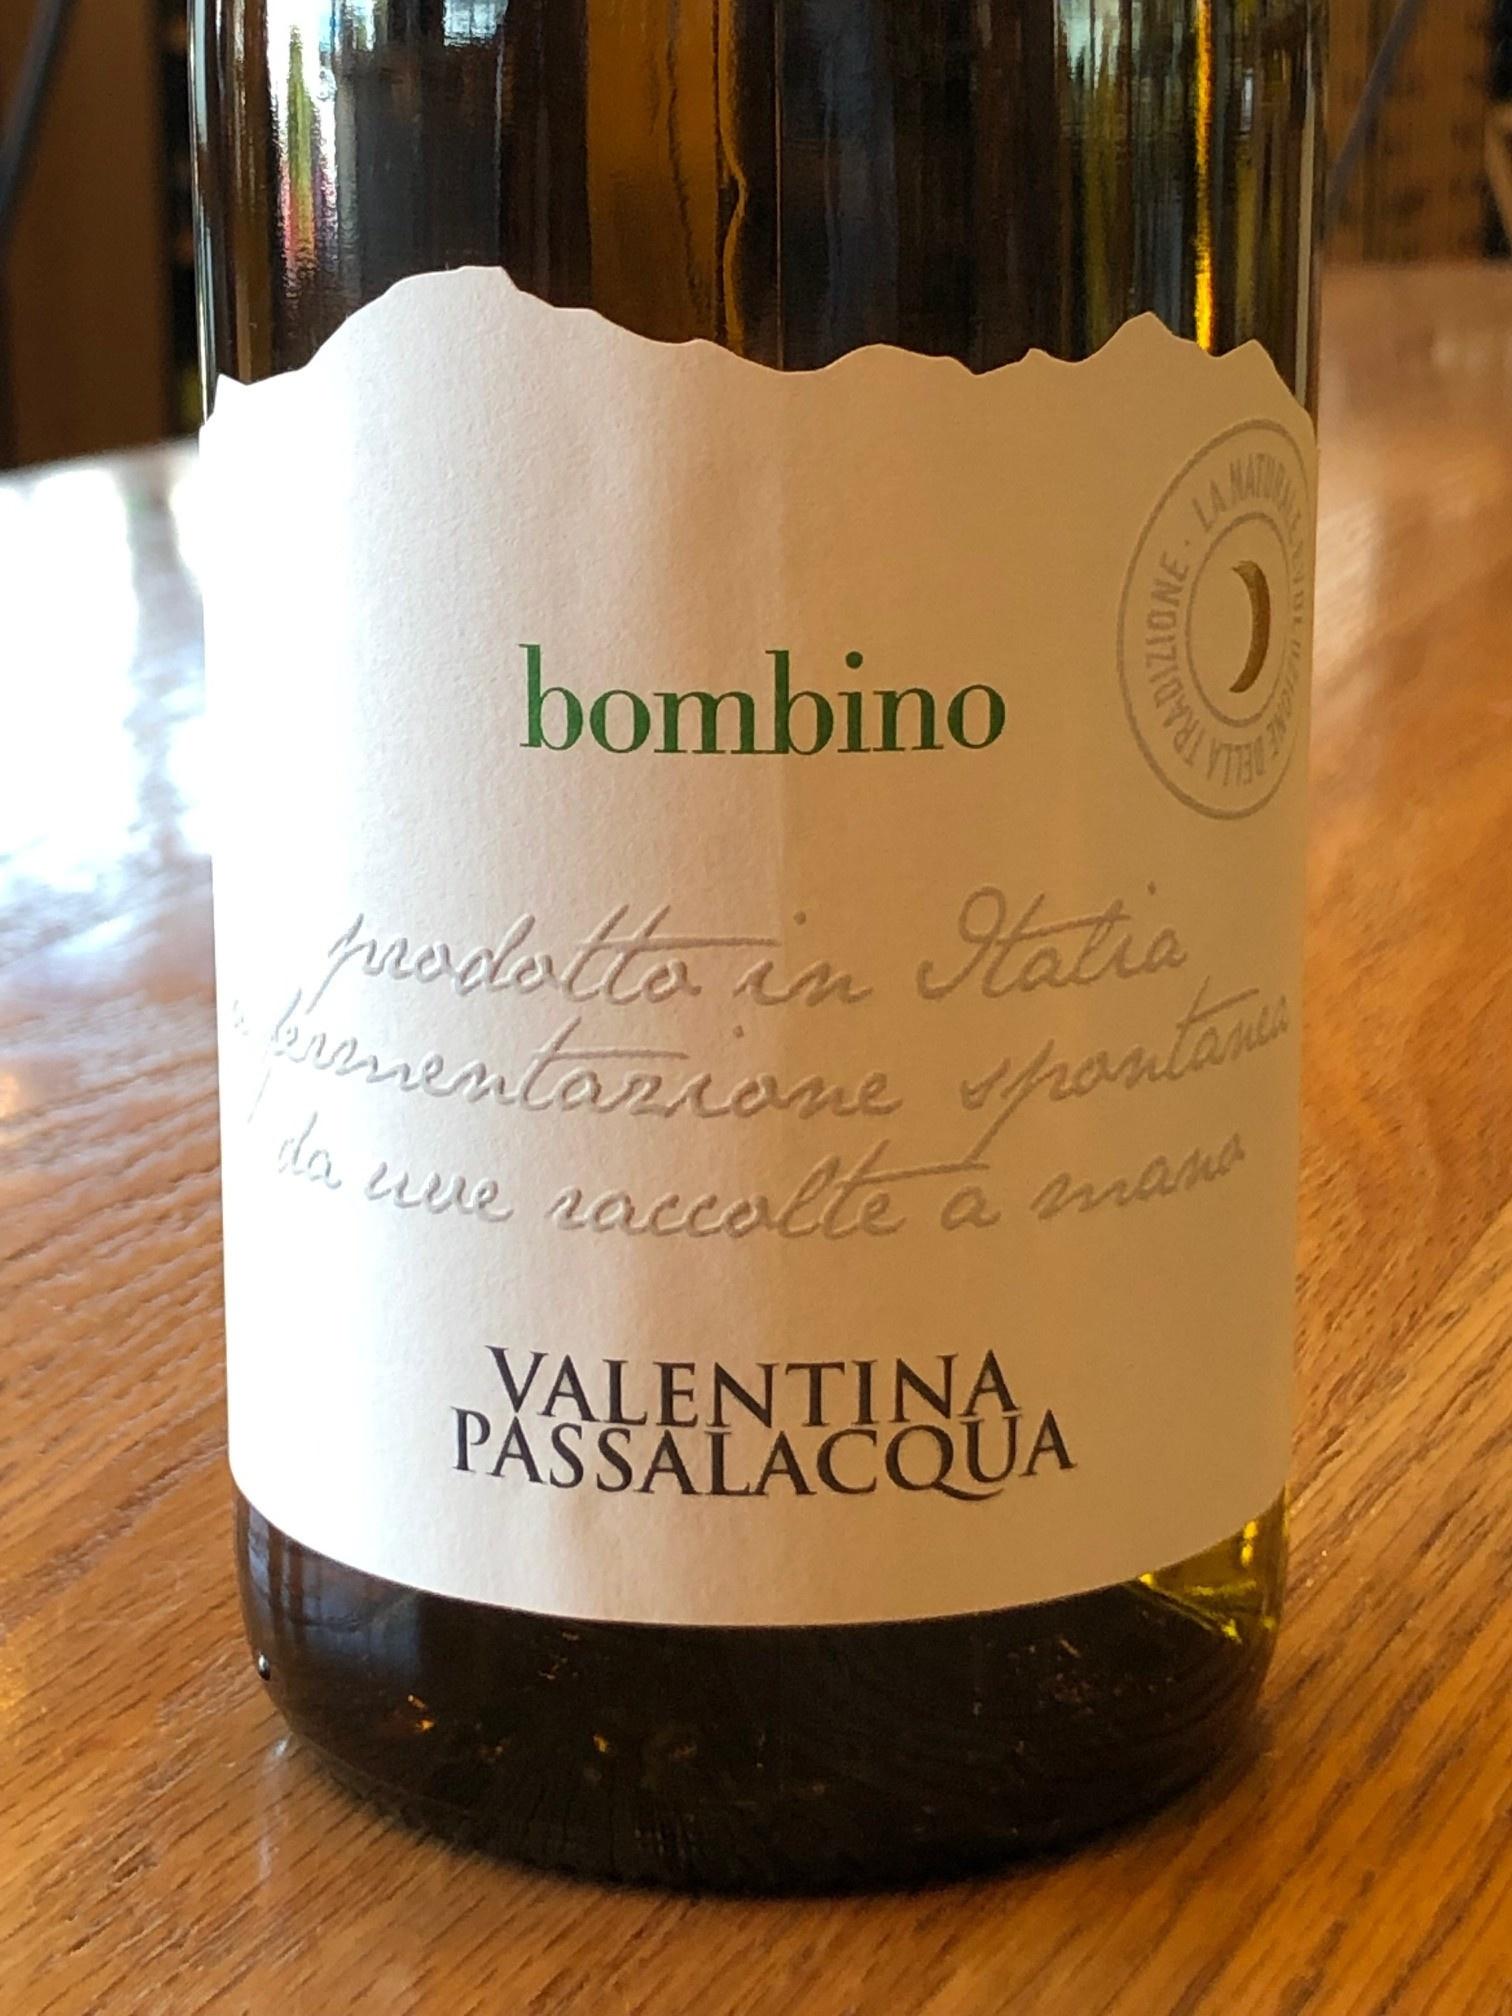 2016 Valentina Passalacqua Bombino 750ml